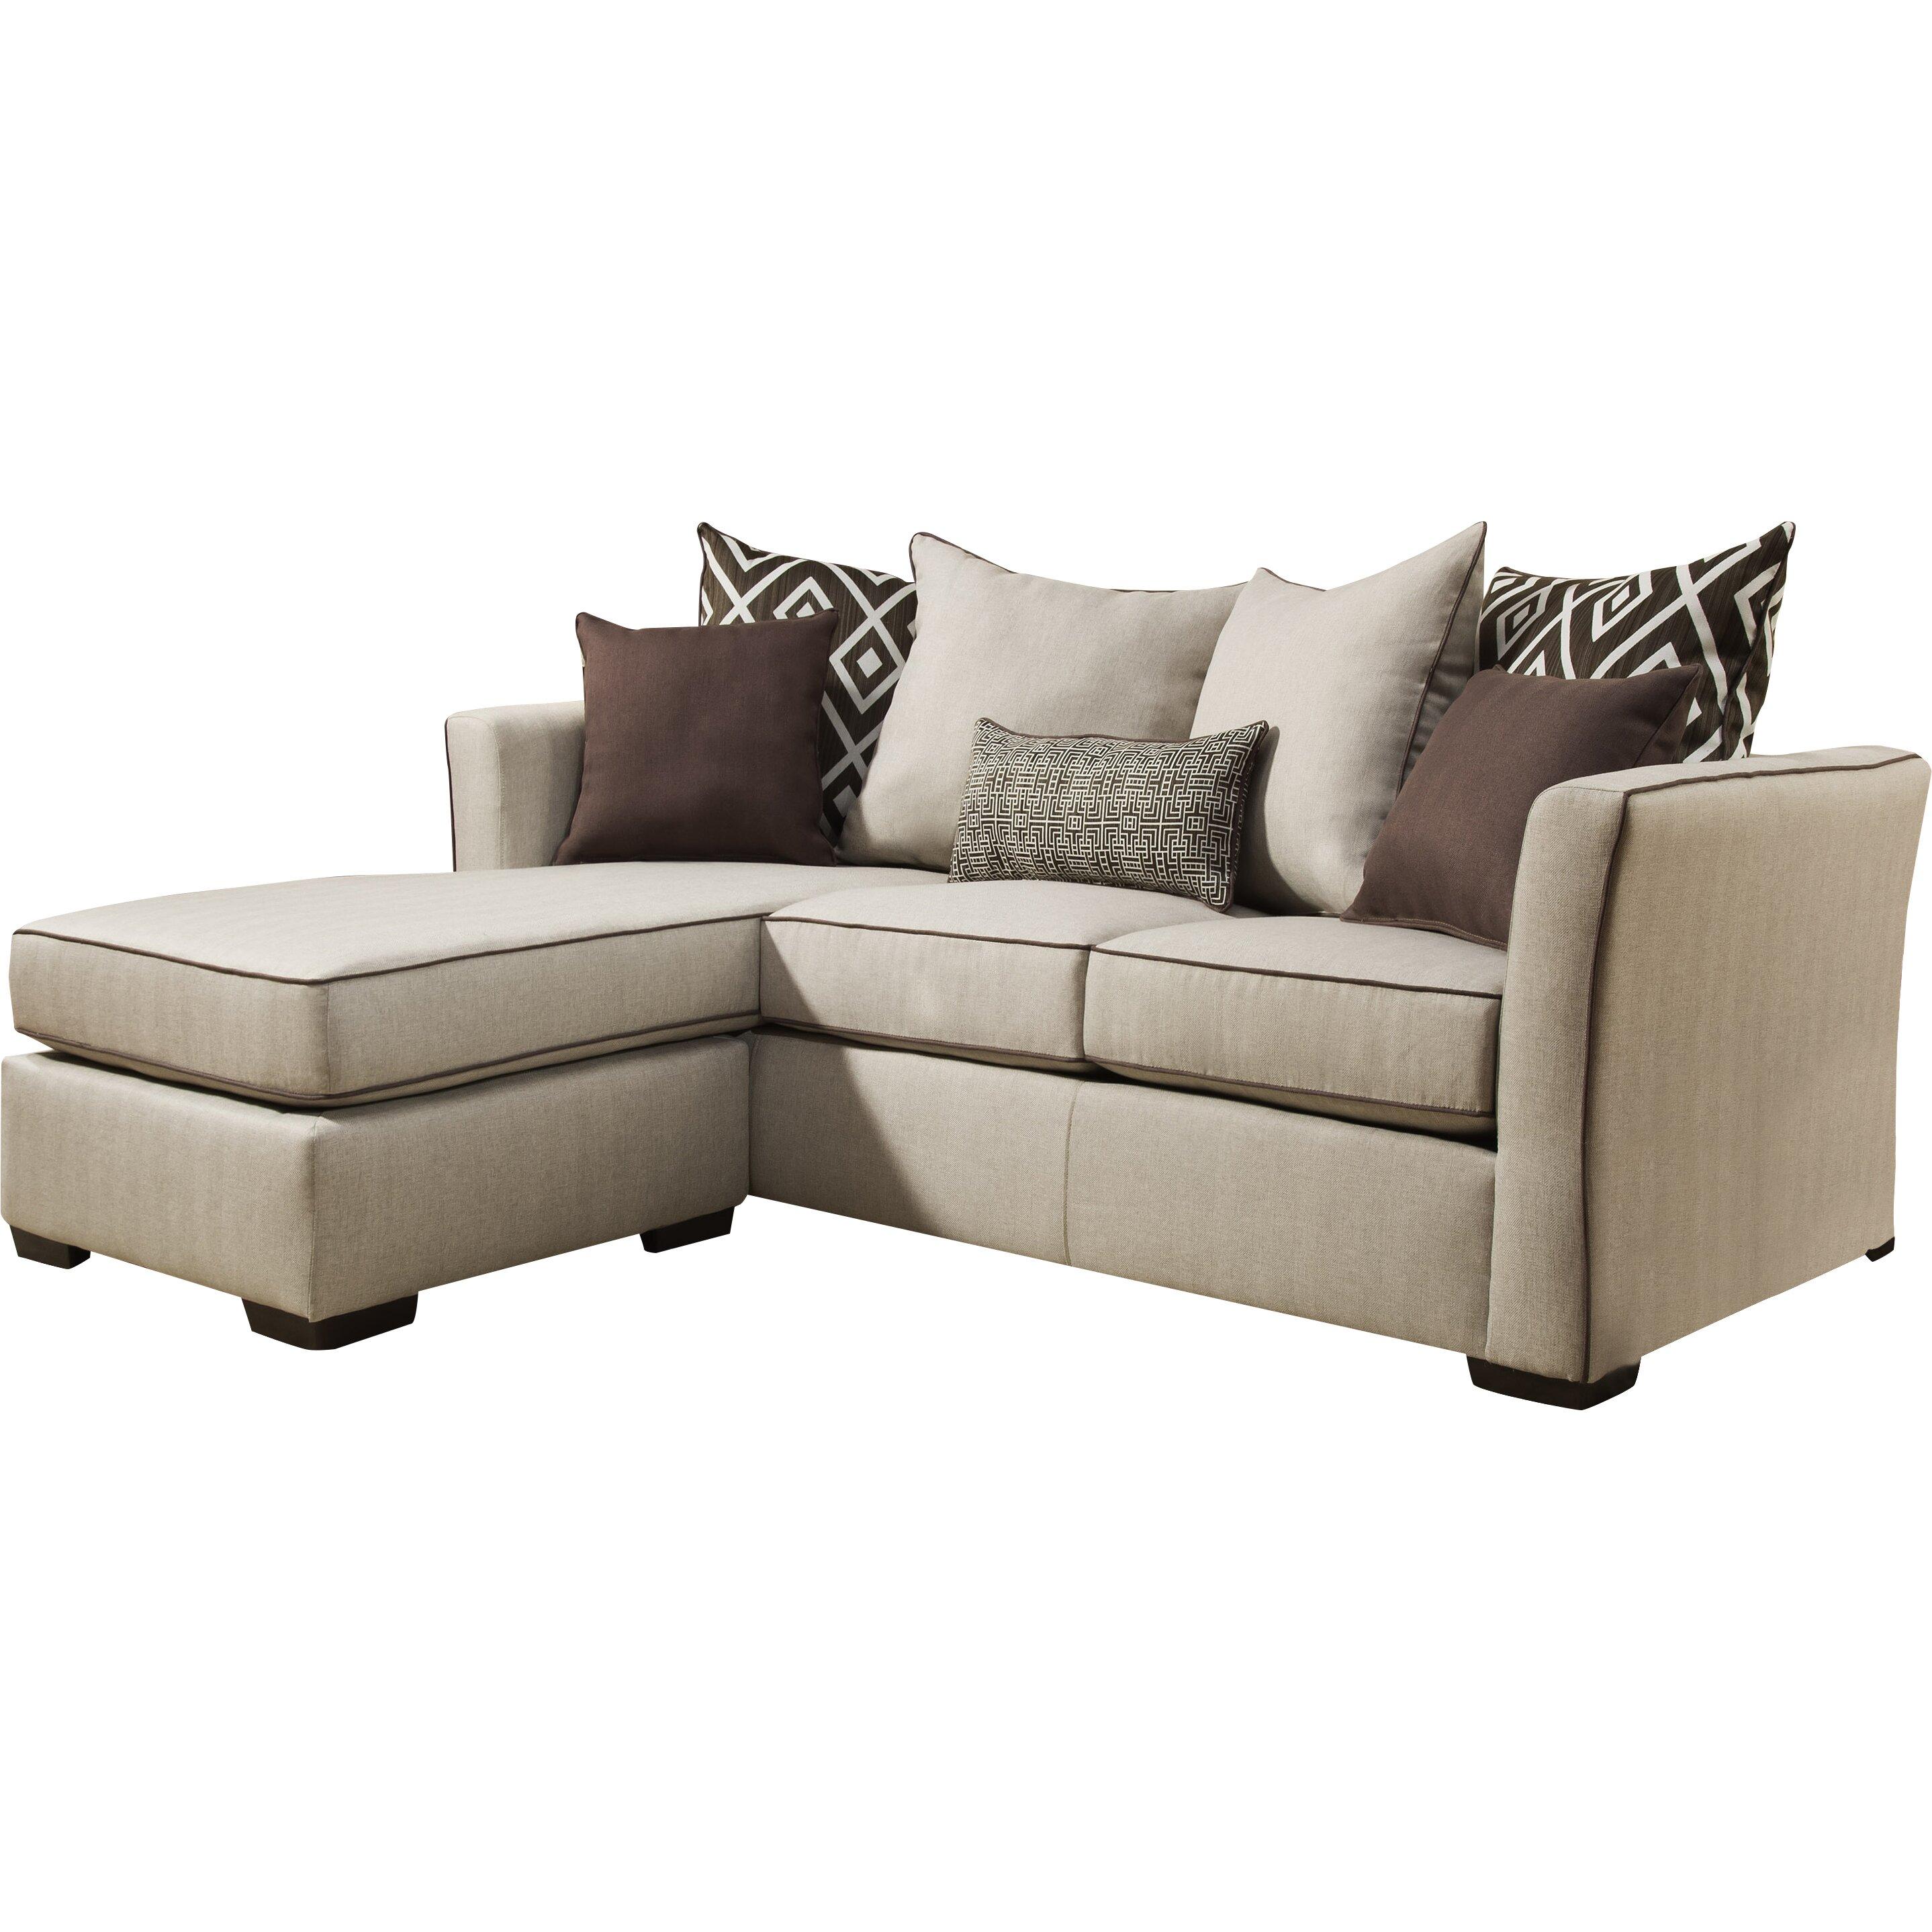 Bobkona Lexington Reversible Chaise Sectional Sofa With